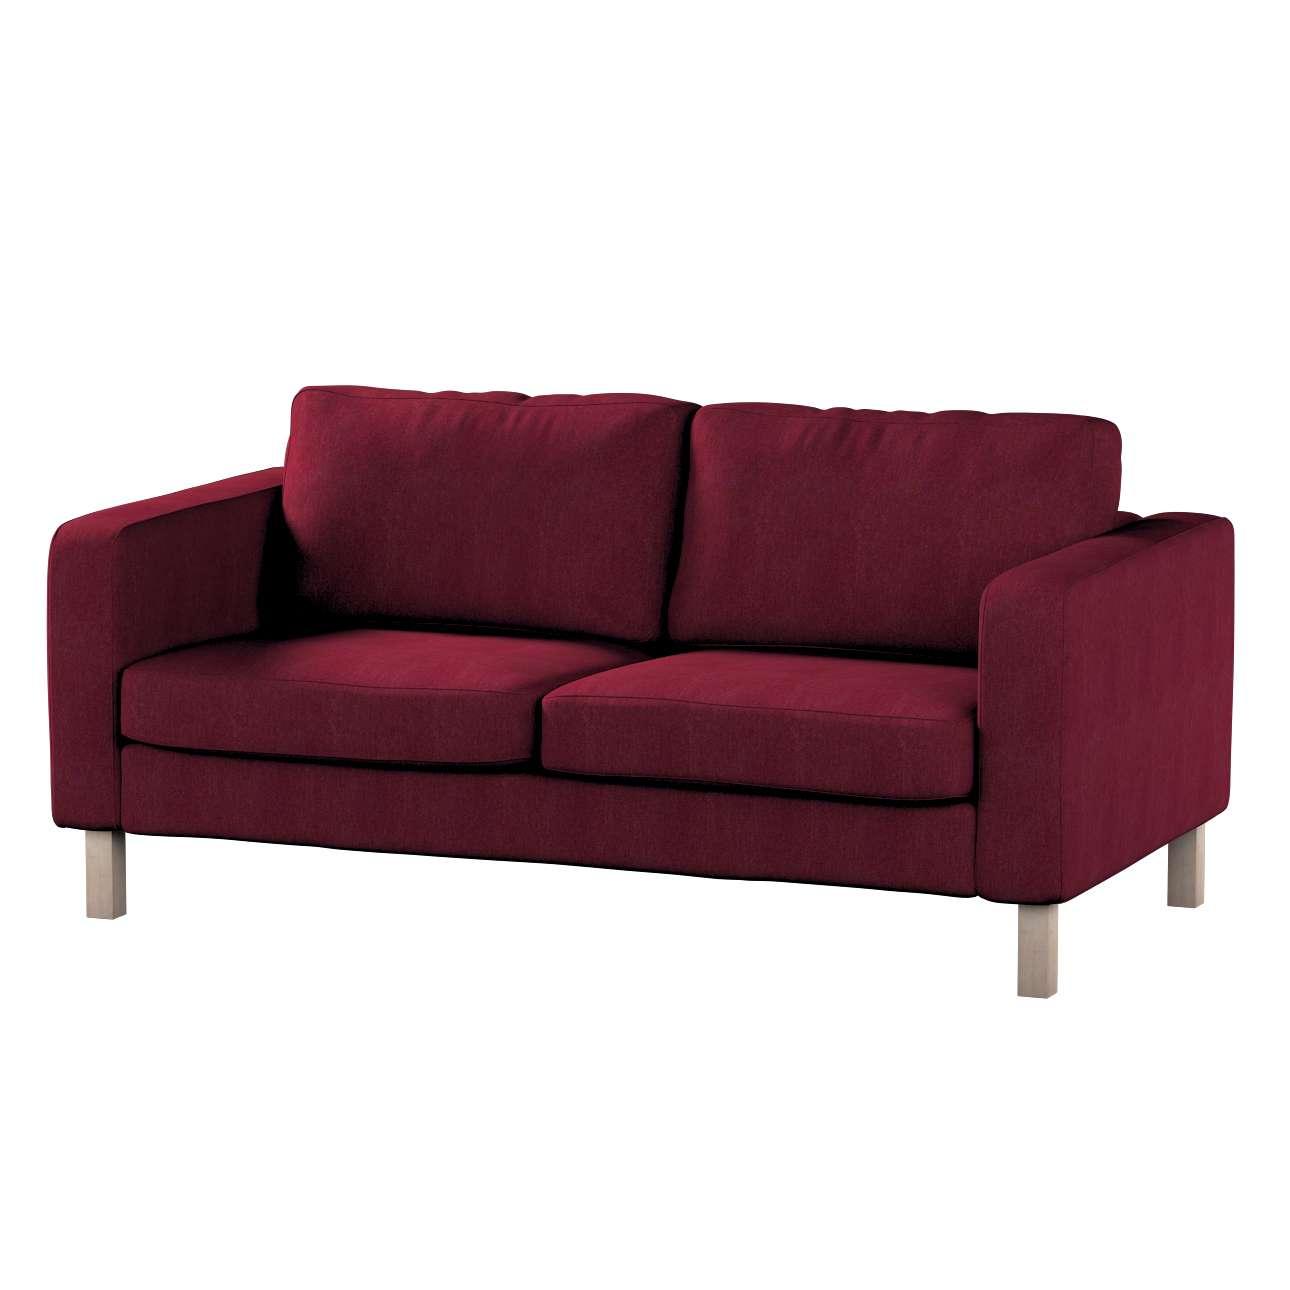 KARSLTAD dvivietės sofos užvalkalas Karlstad 2-vietės sofos užvalkalas kolekcijoje Chenille, audinys: 702-19